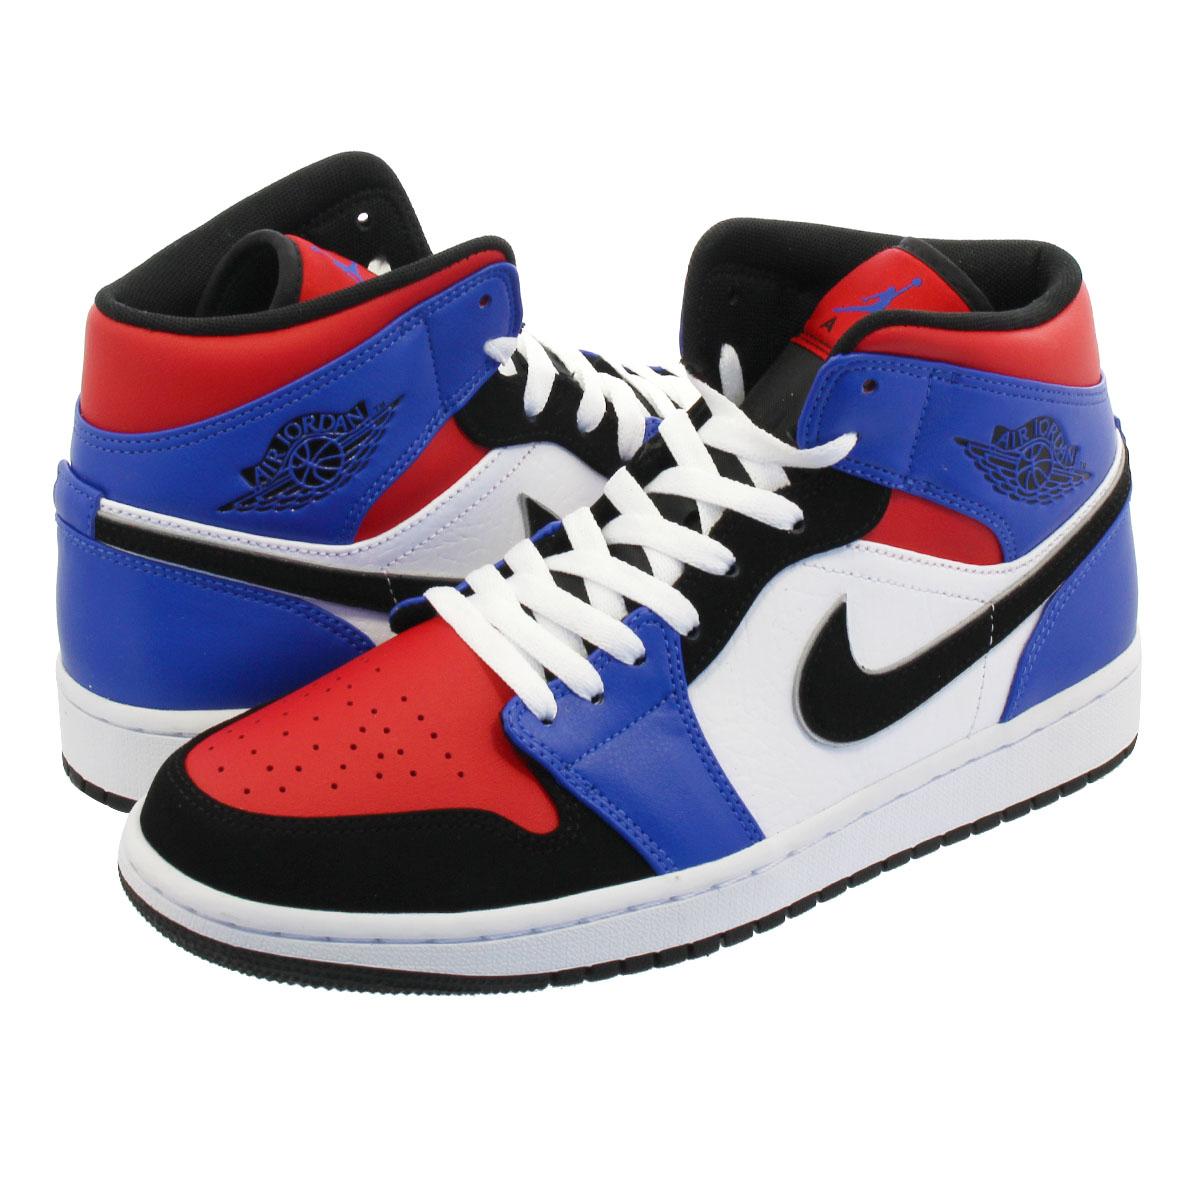 db5339324c1 NIKE AIR JORDAN 1 MID Nike Air Jordan 1 mid WHITE/BLACK/HYPER ROYAL